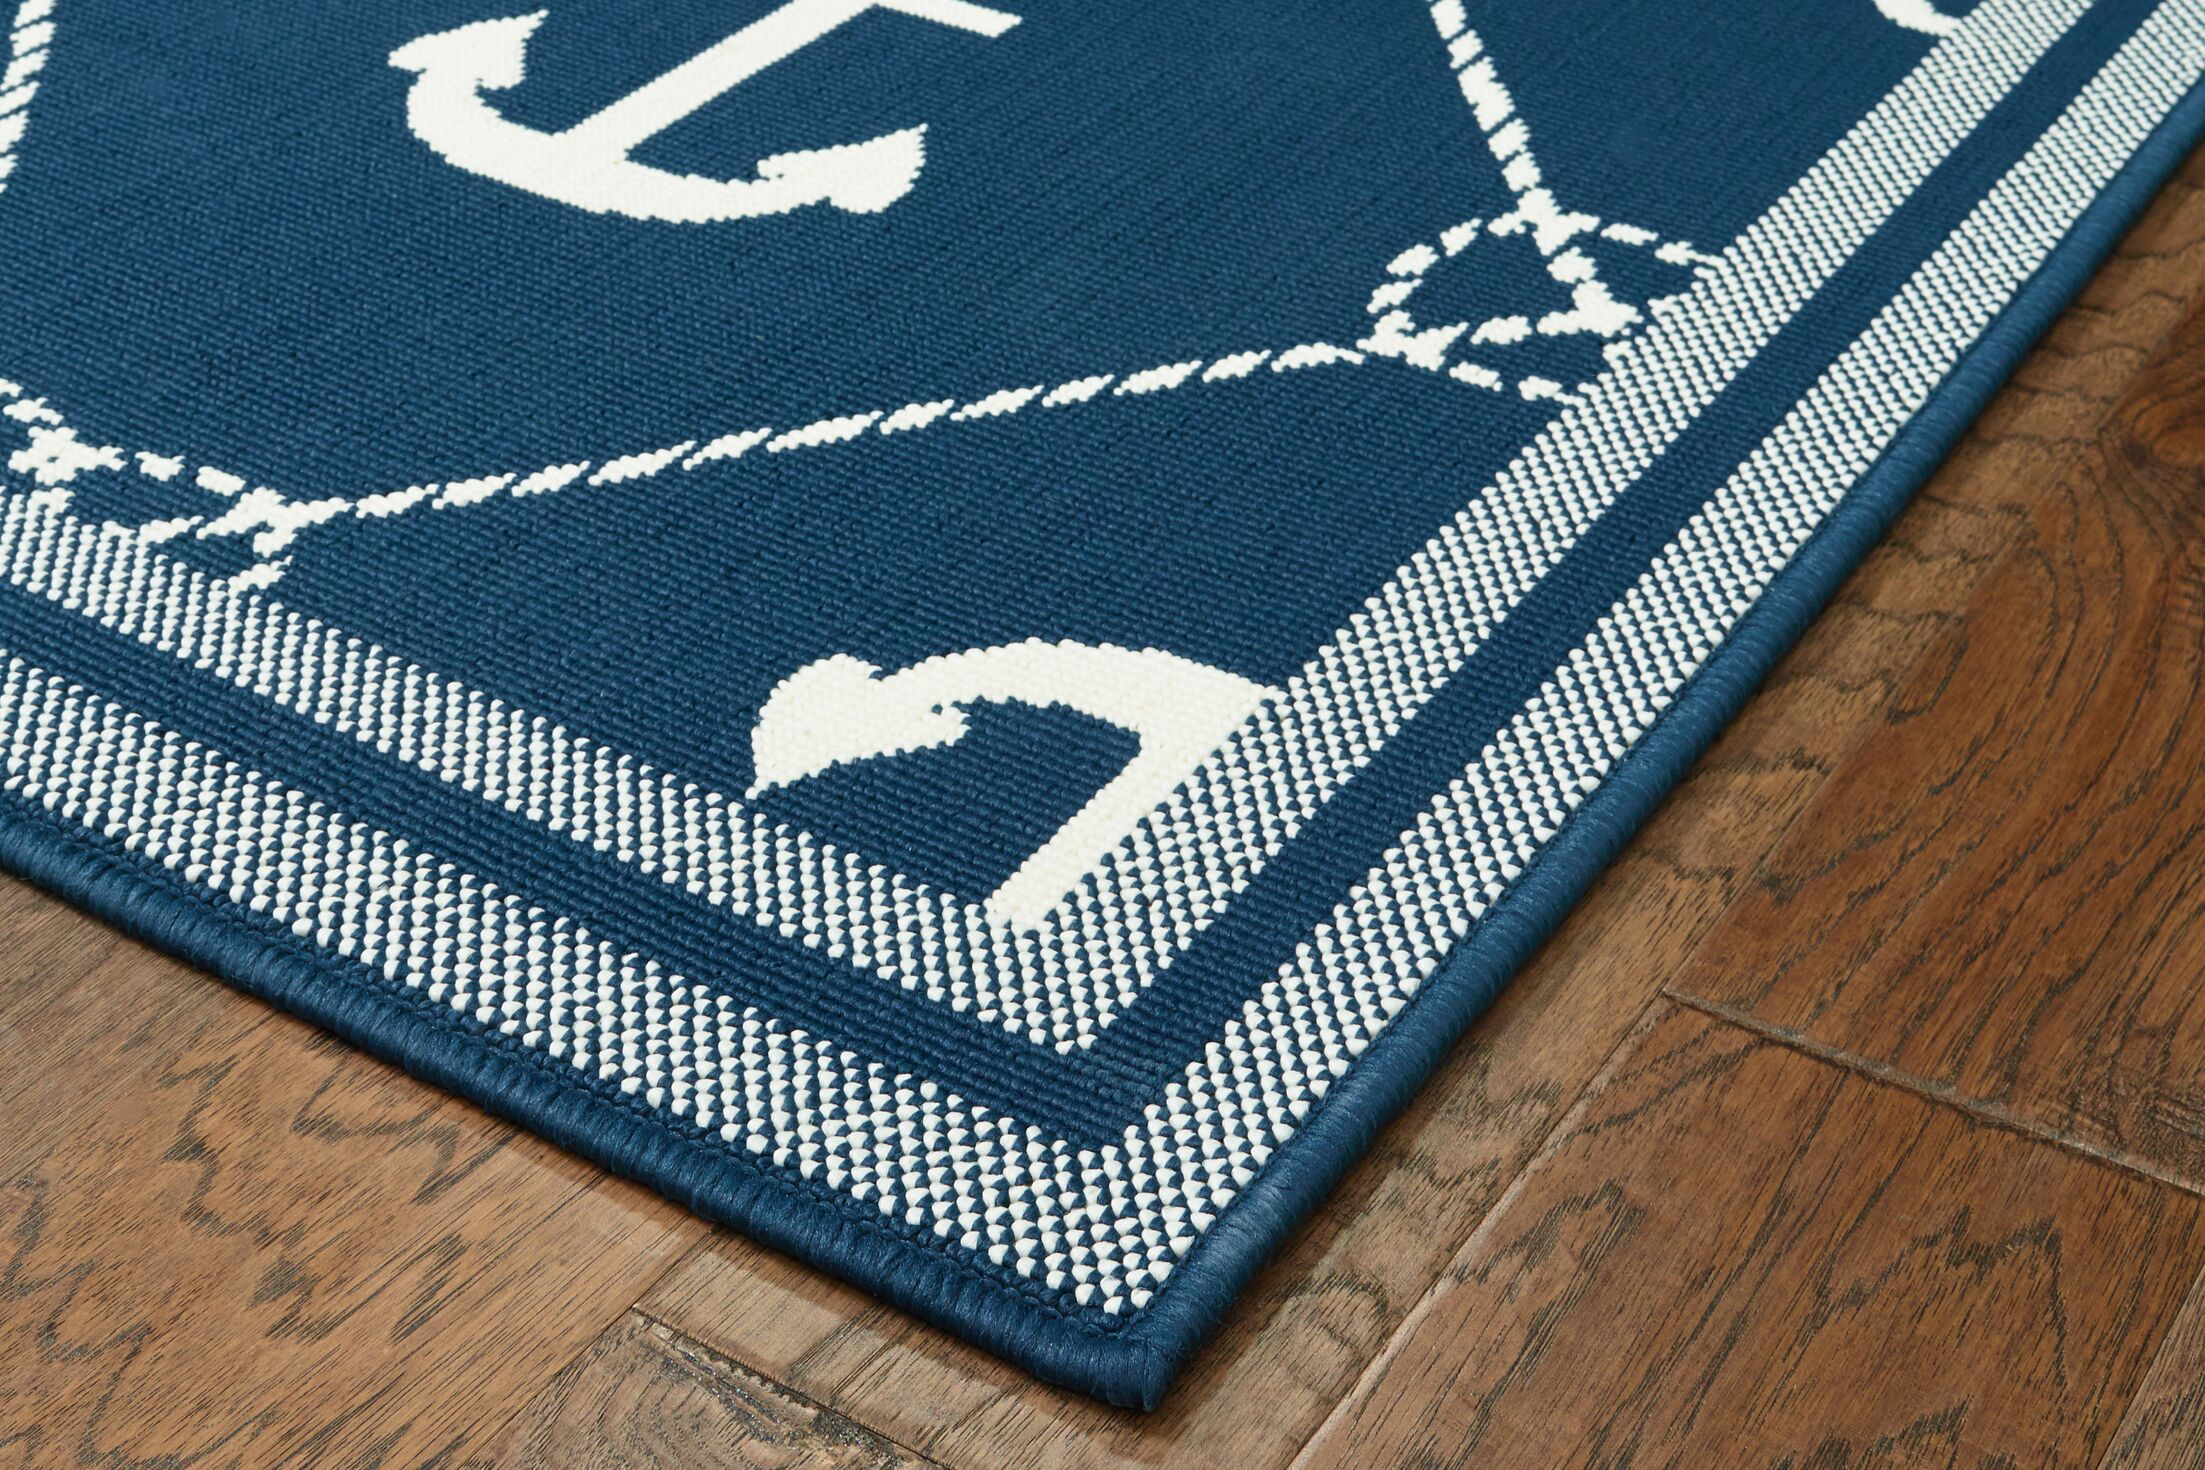 Mariam Anchor Navy Indoor/Outdoor Area Rug Rug Size: 5' x 7'3